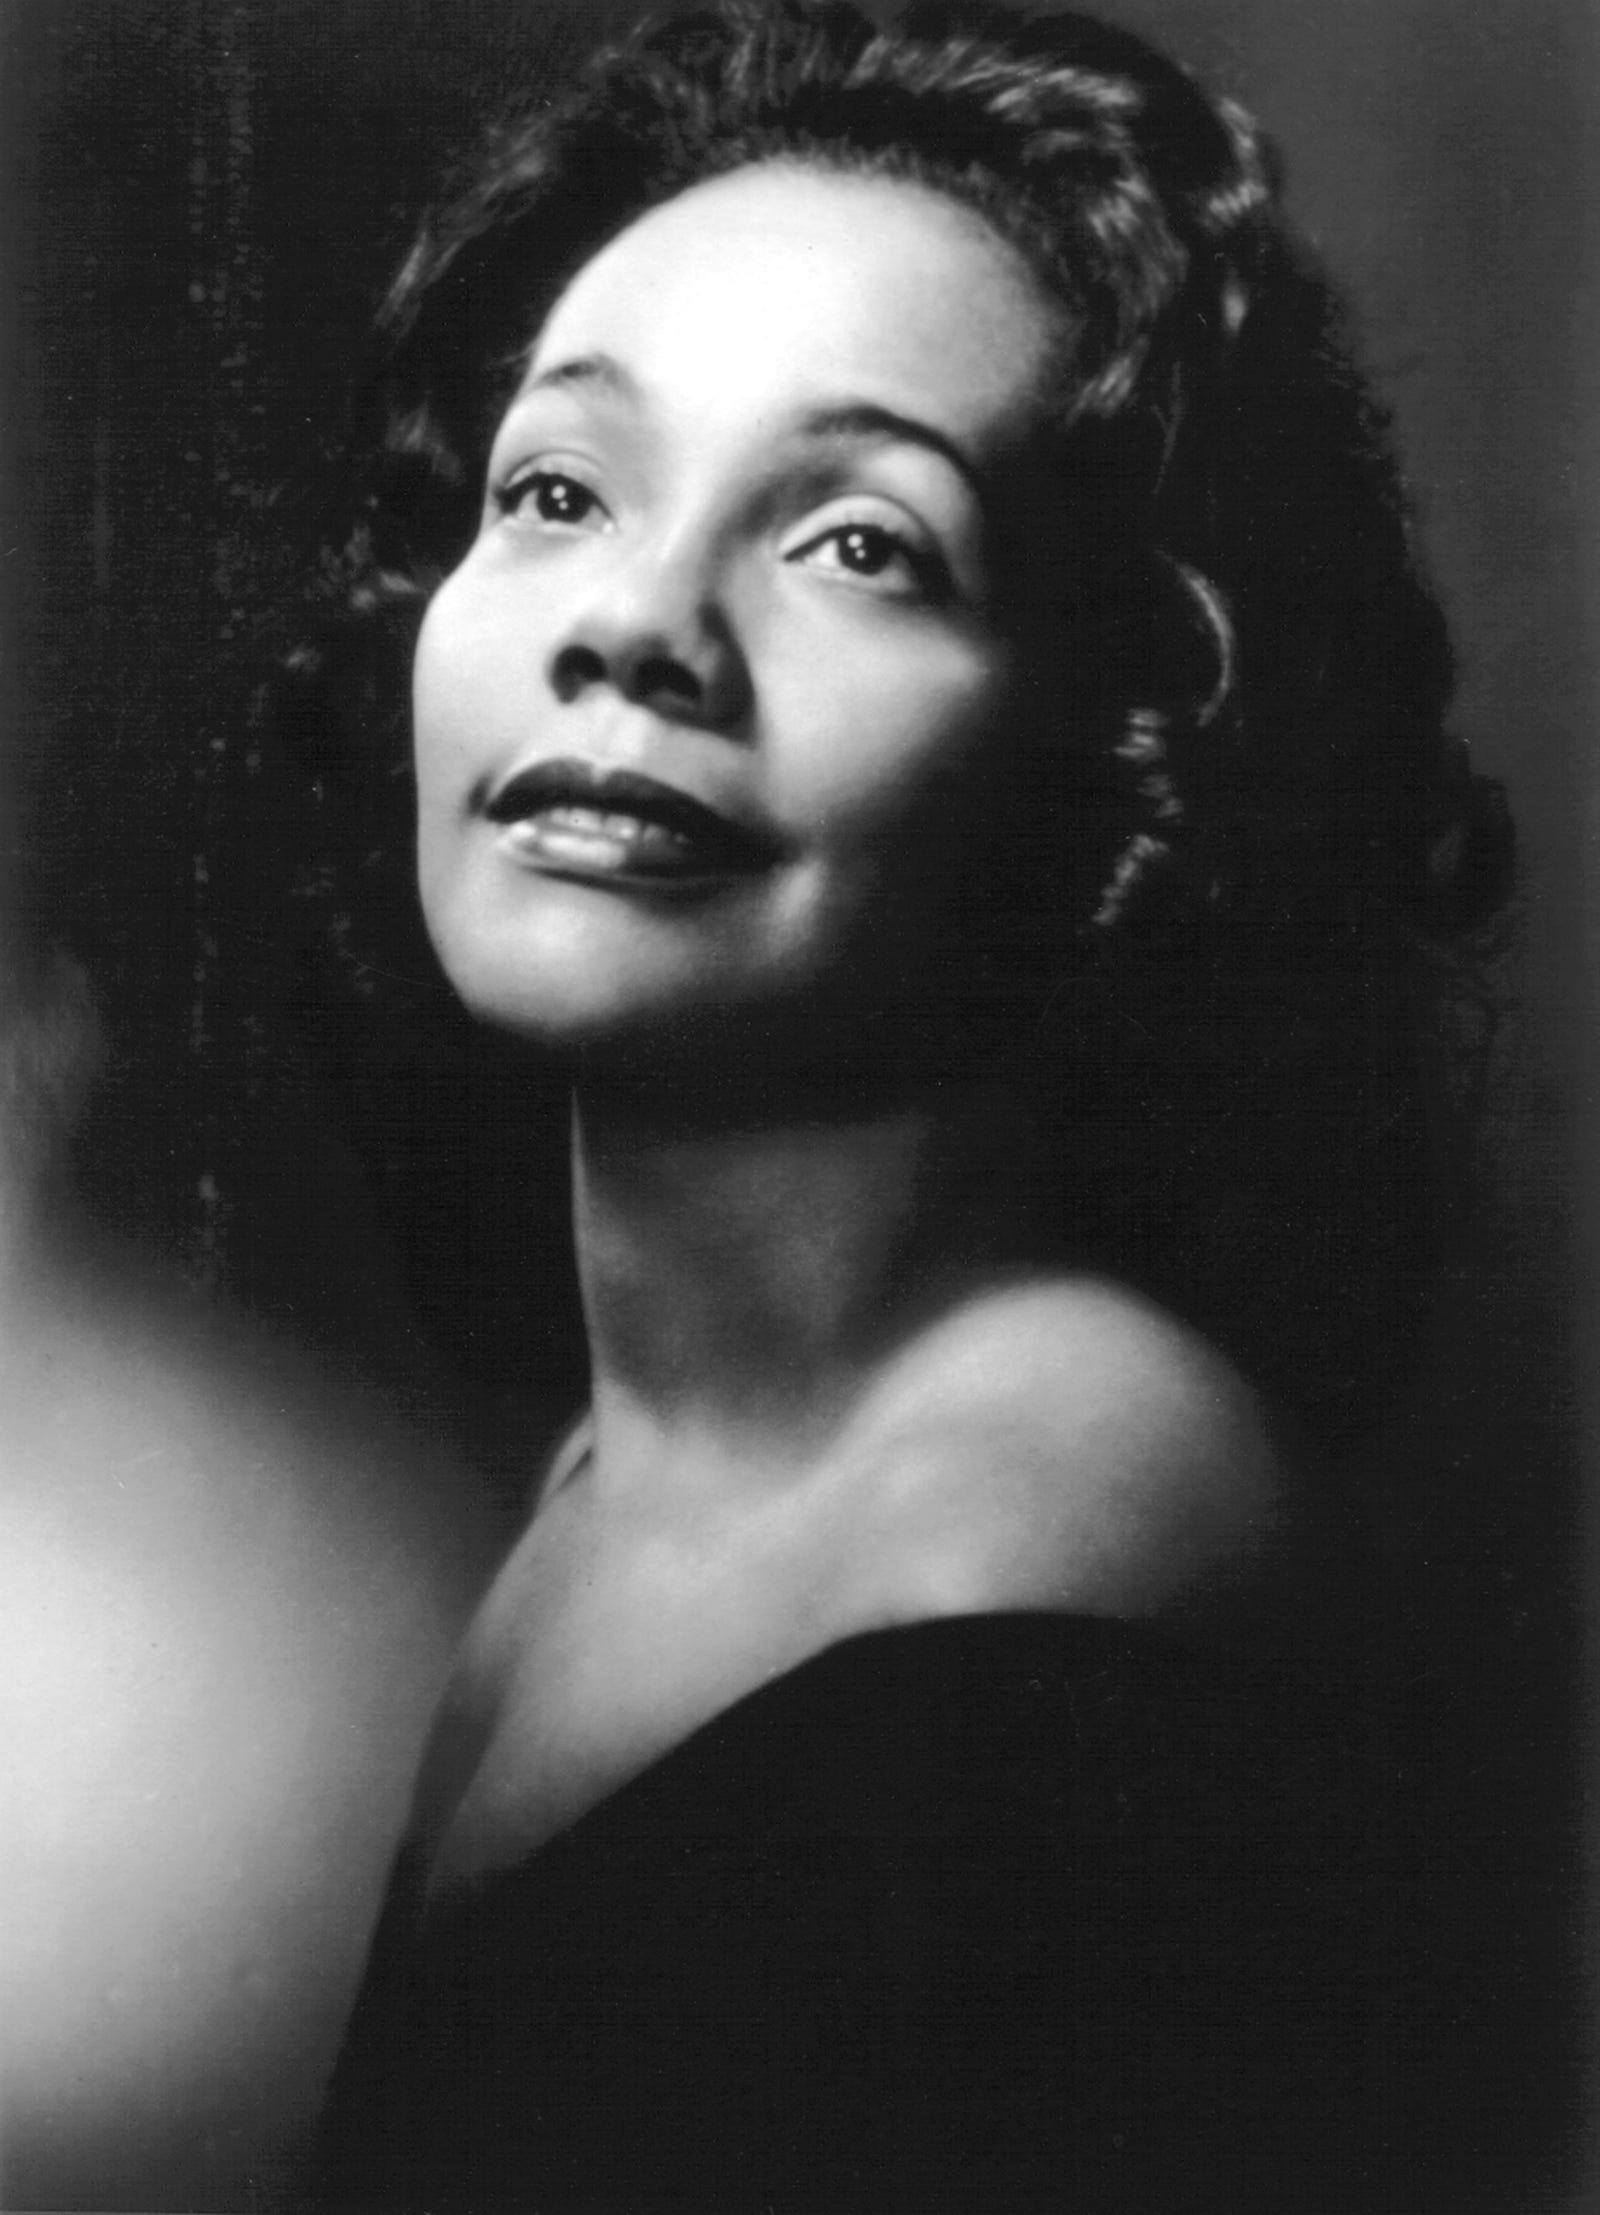 Coretta Scott King, date unknown, via the Schomburg Center (Photo12/UIG/Getty Images)